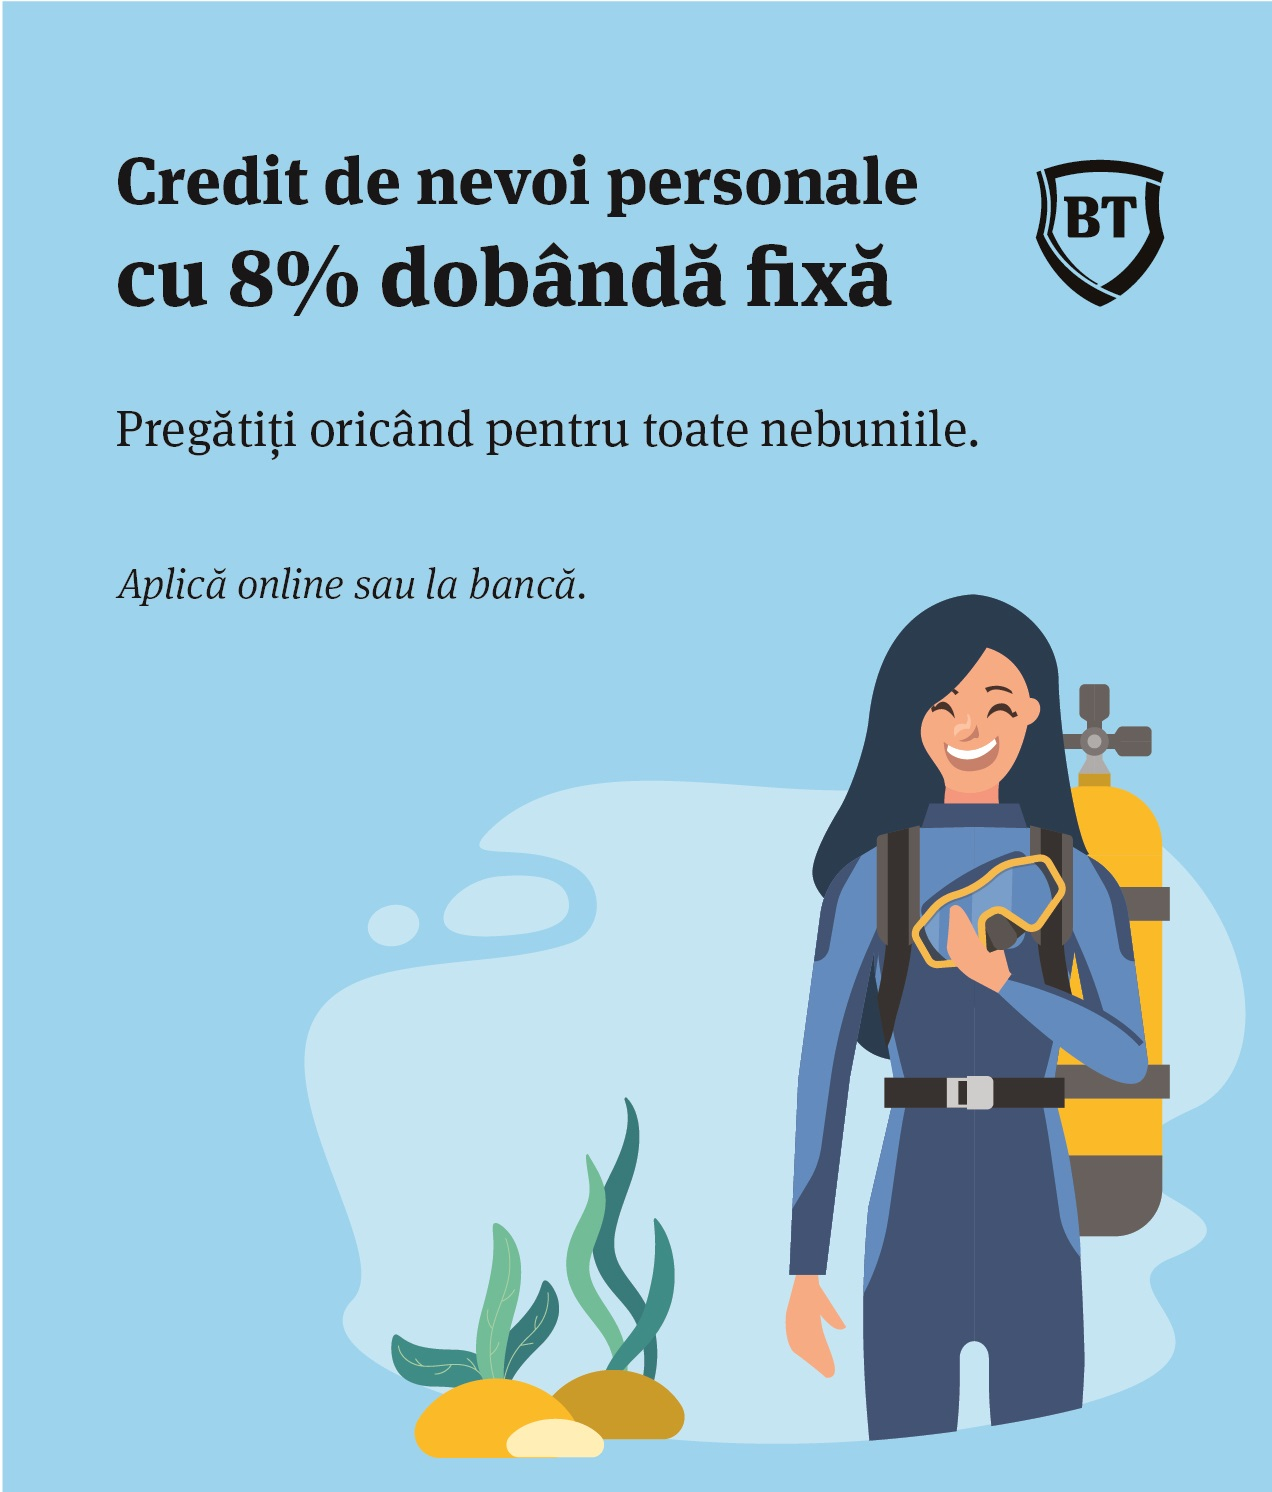 Credit nevoi personale bt pareri